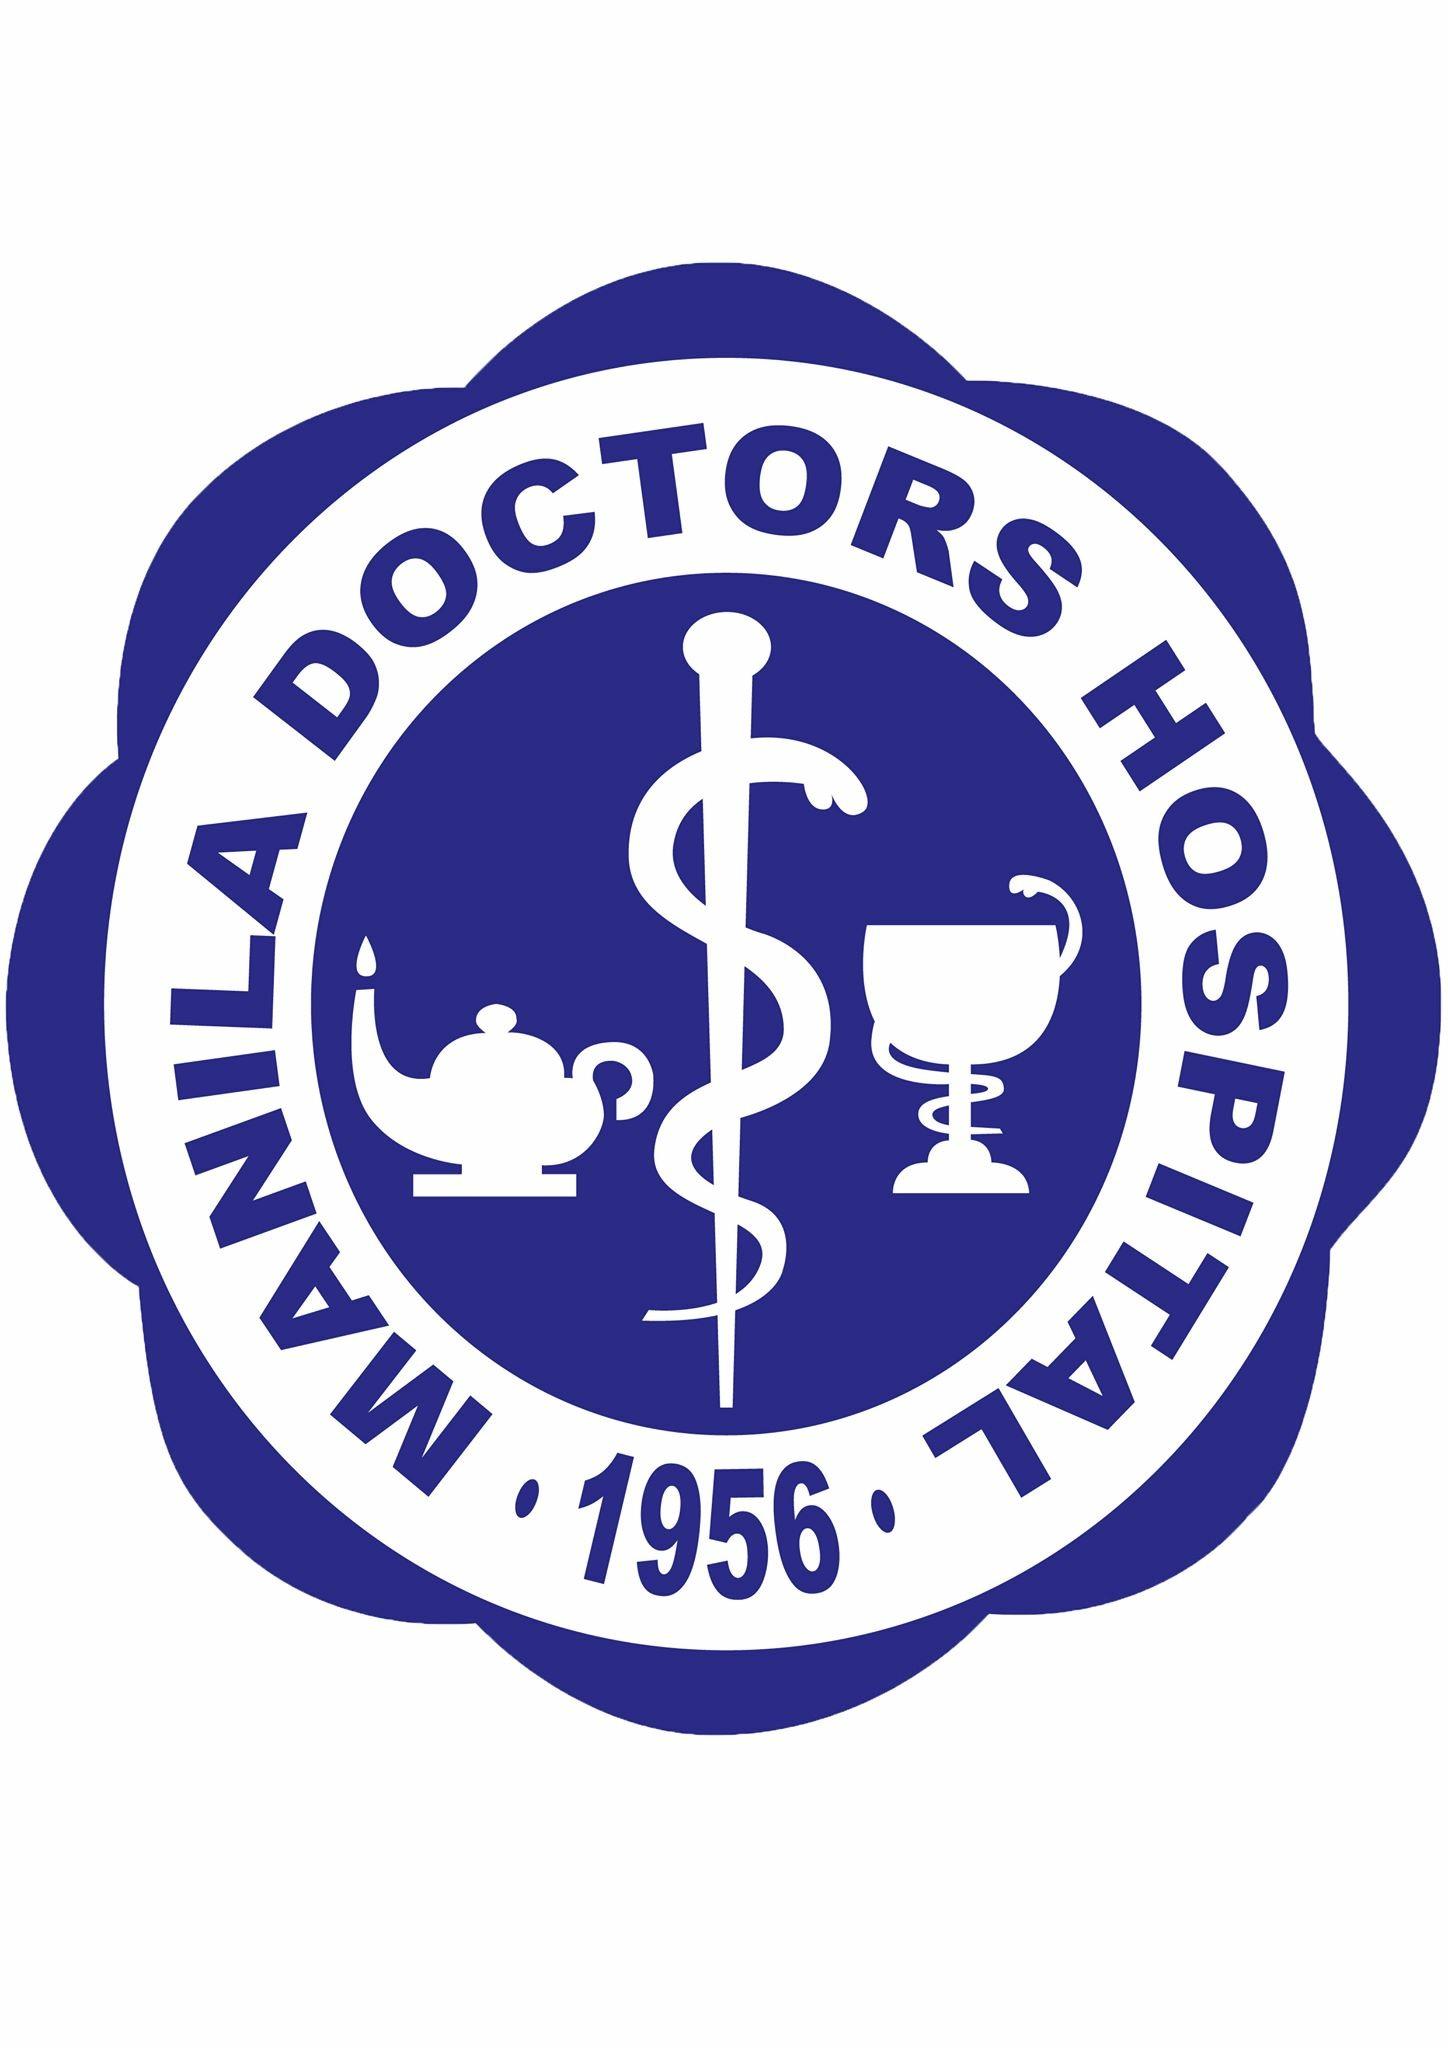 Manila Doctors Hospital - Room No. 705